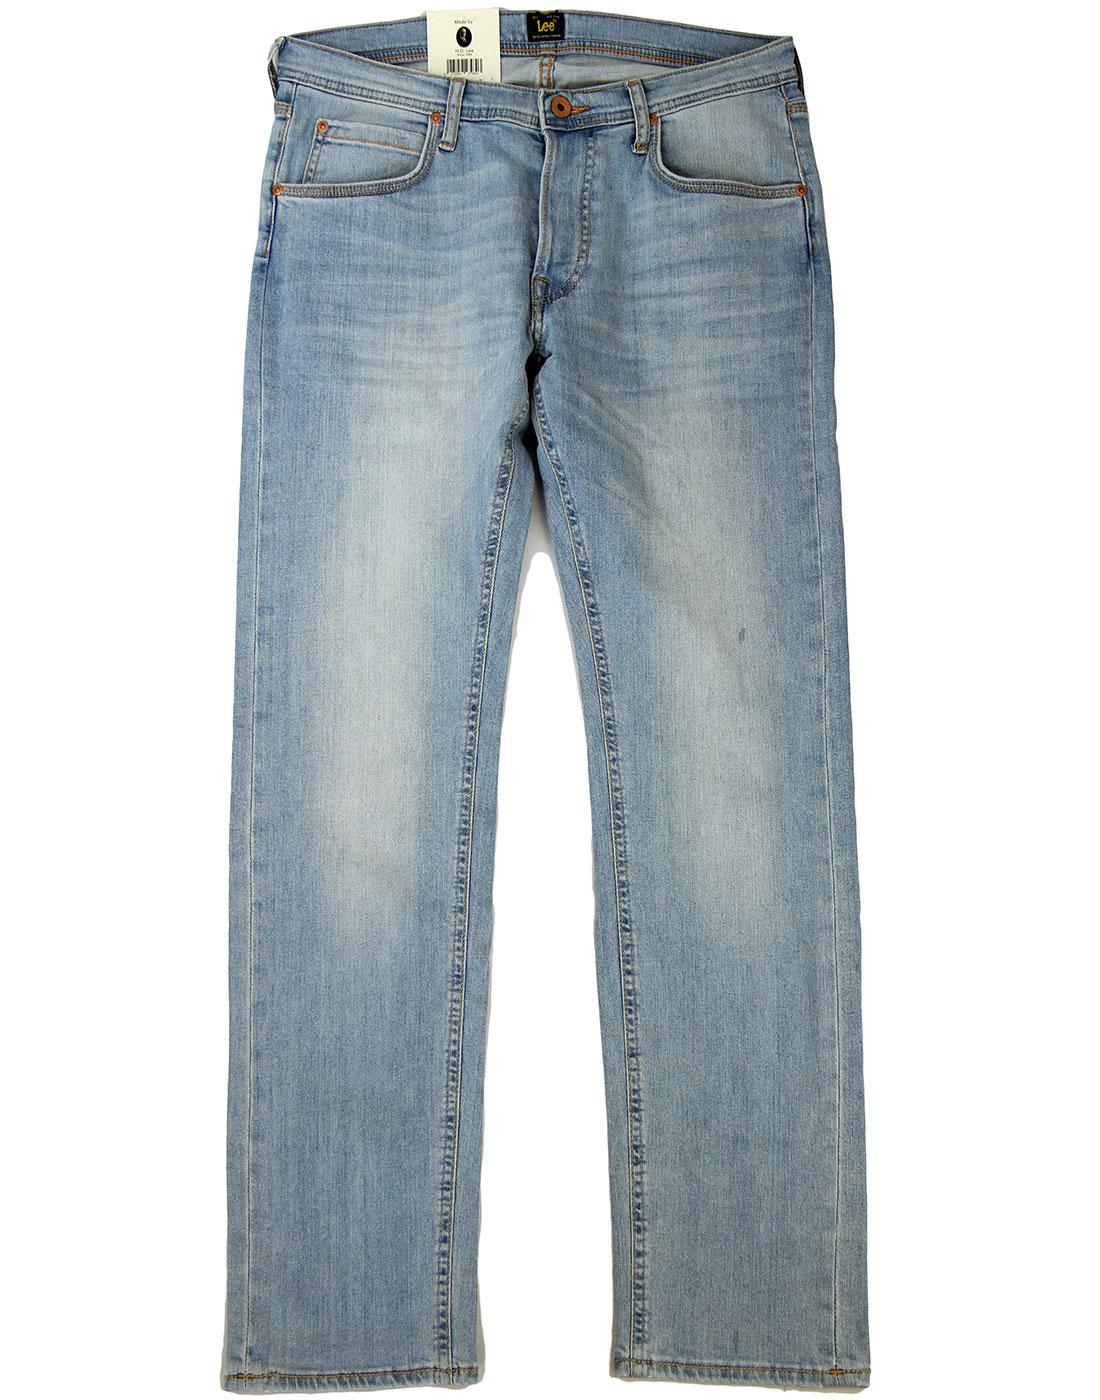 Daren LEE Regular Slim Summer Wind Denim Jeans